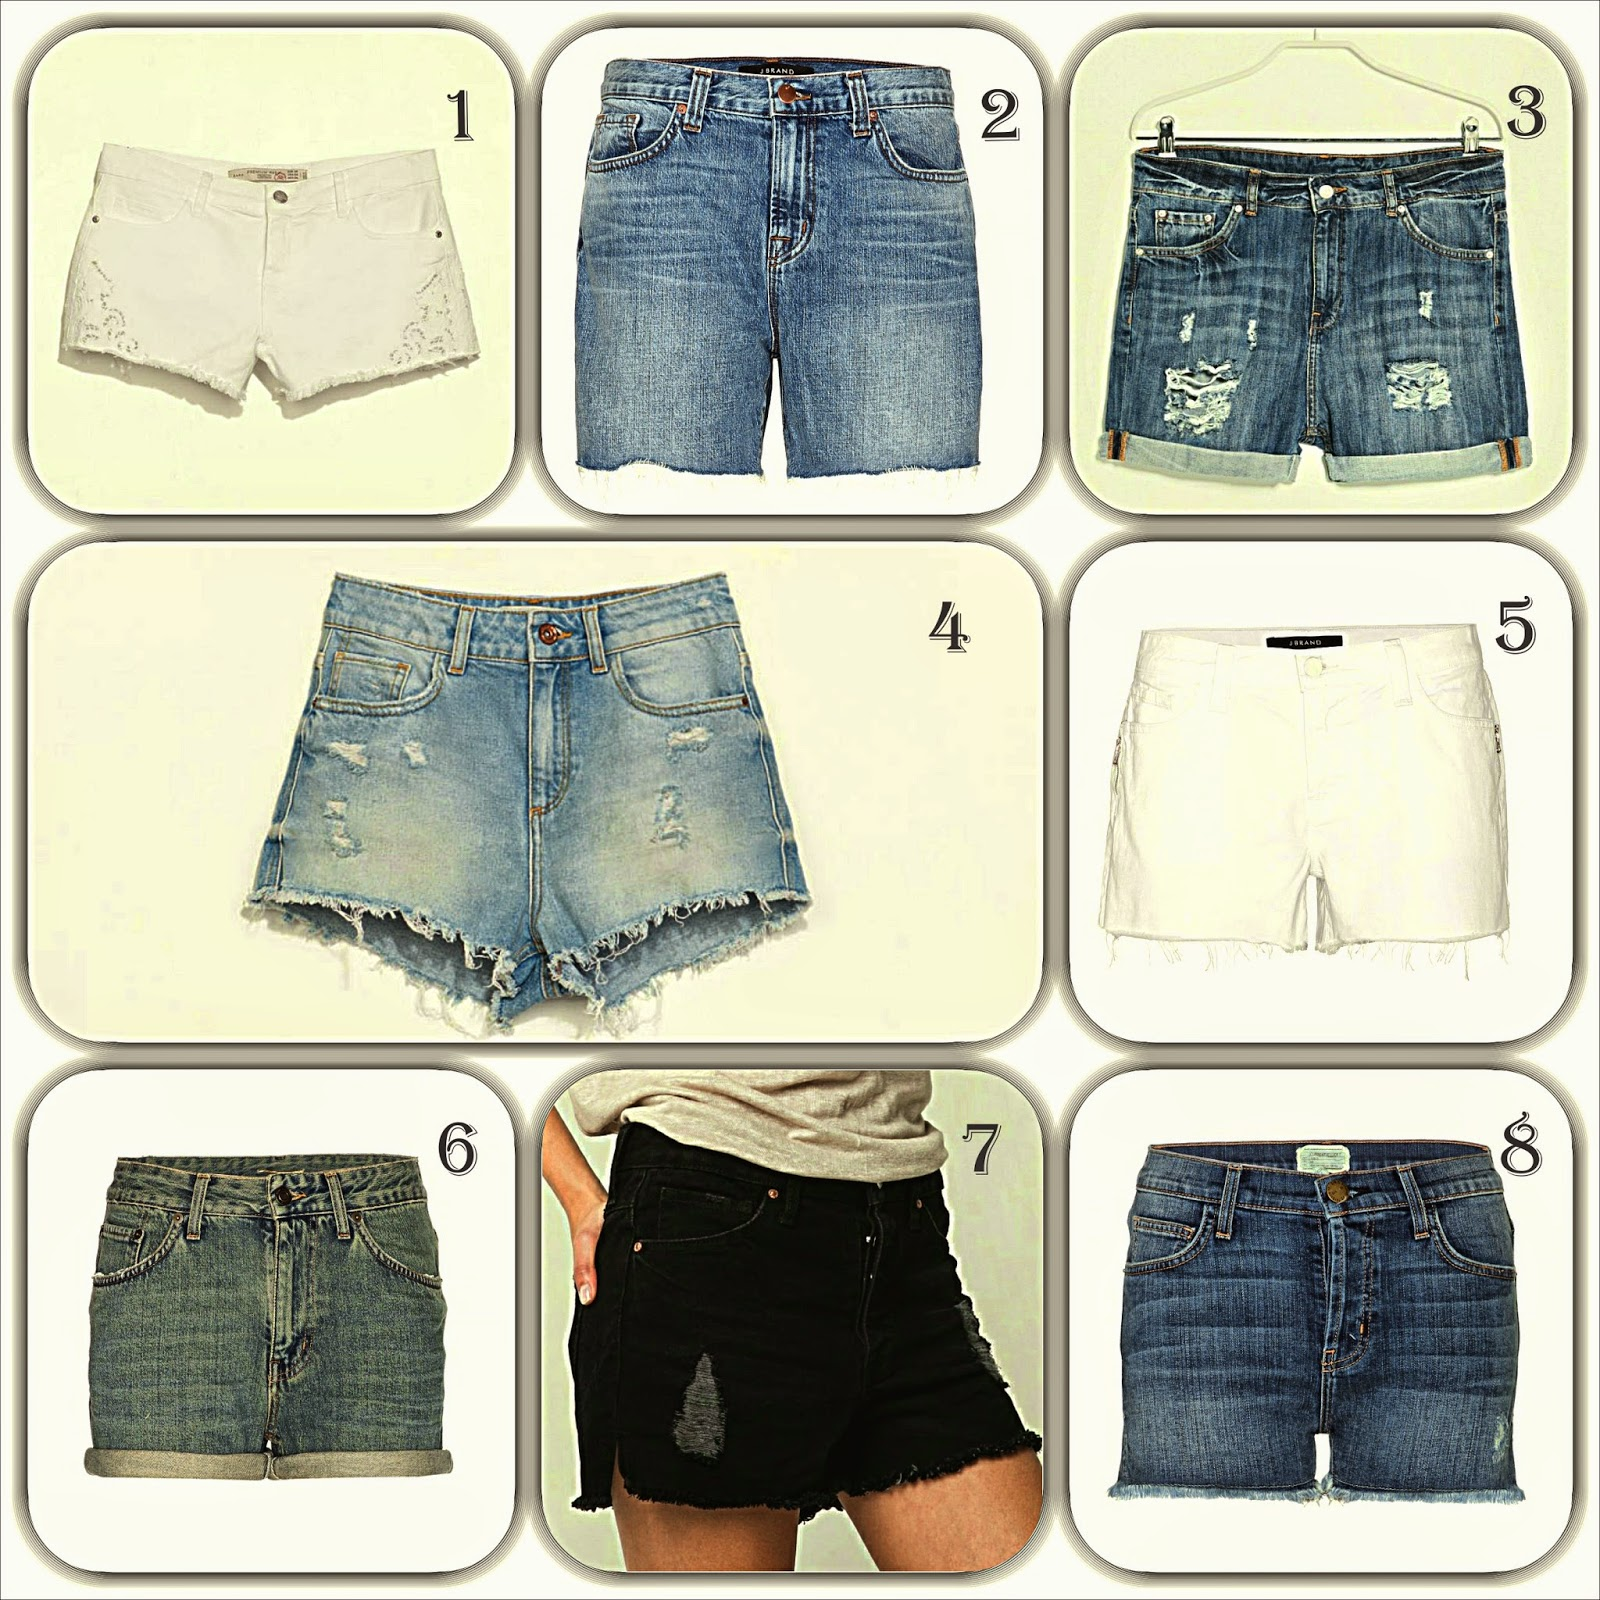 Denim Shorts Selection